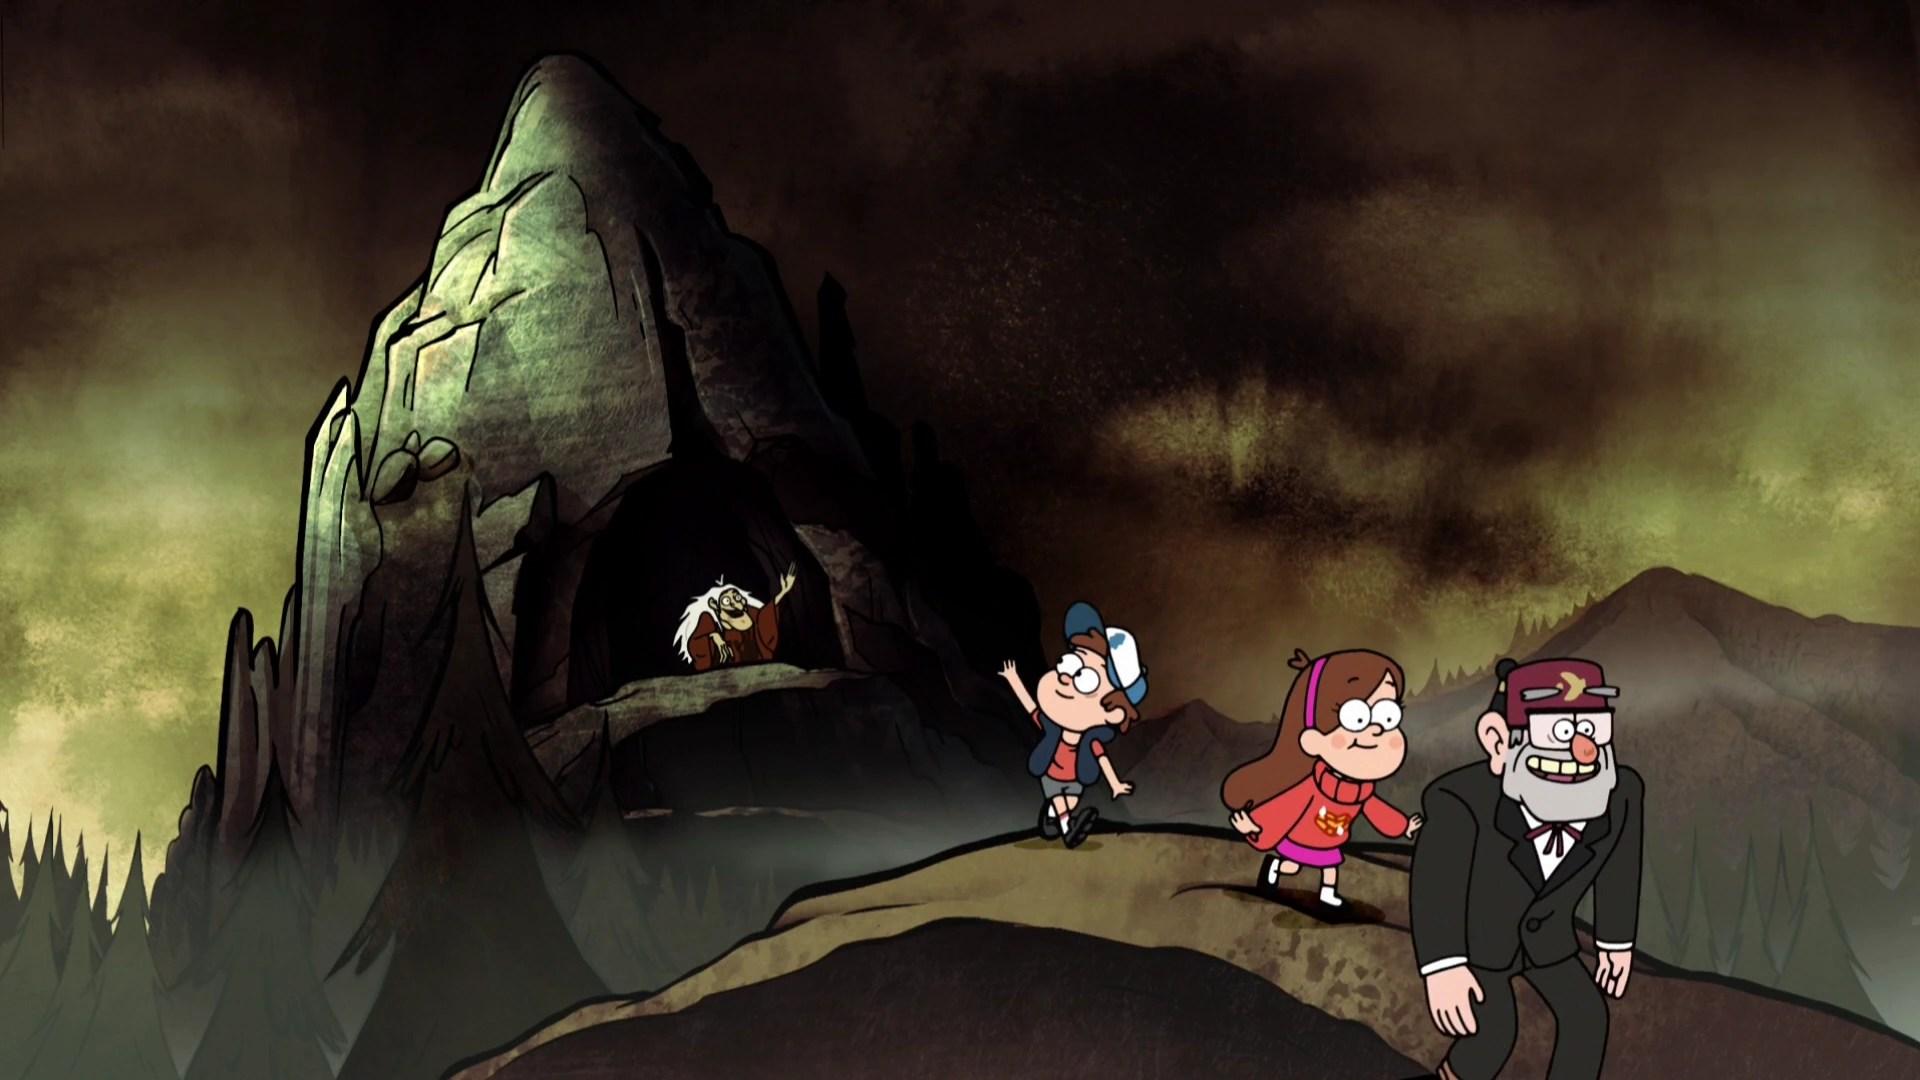 Gravity Falls Wallpaper Pc Hand Witch Mountain Gravity Falls Wiki Fandom Powered